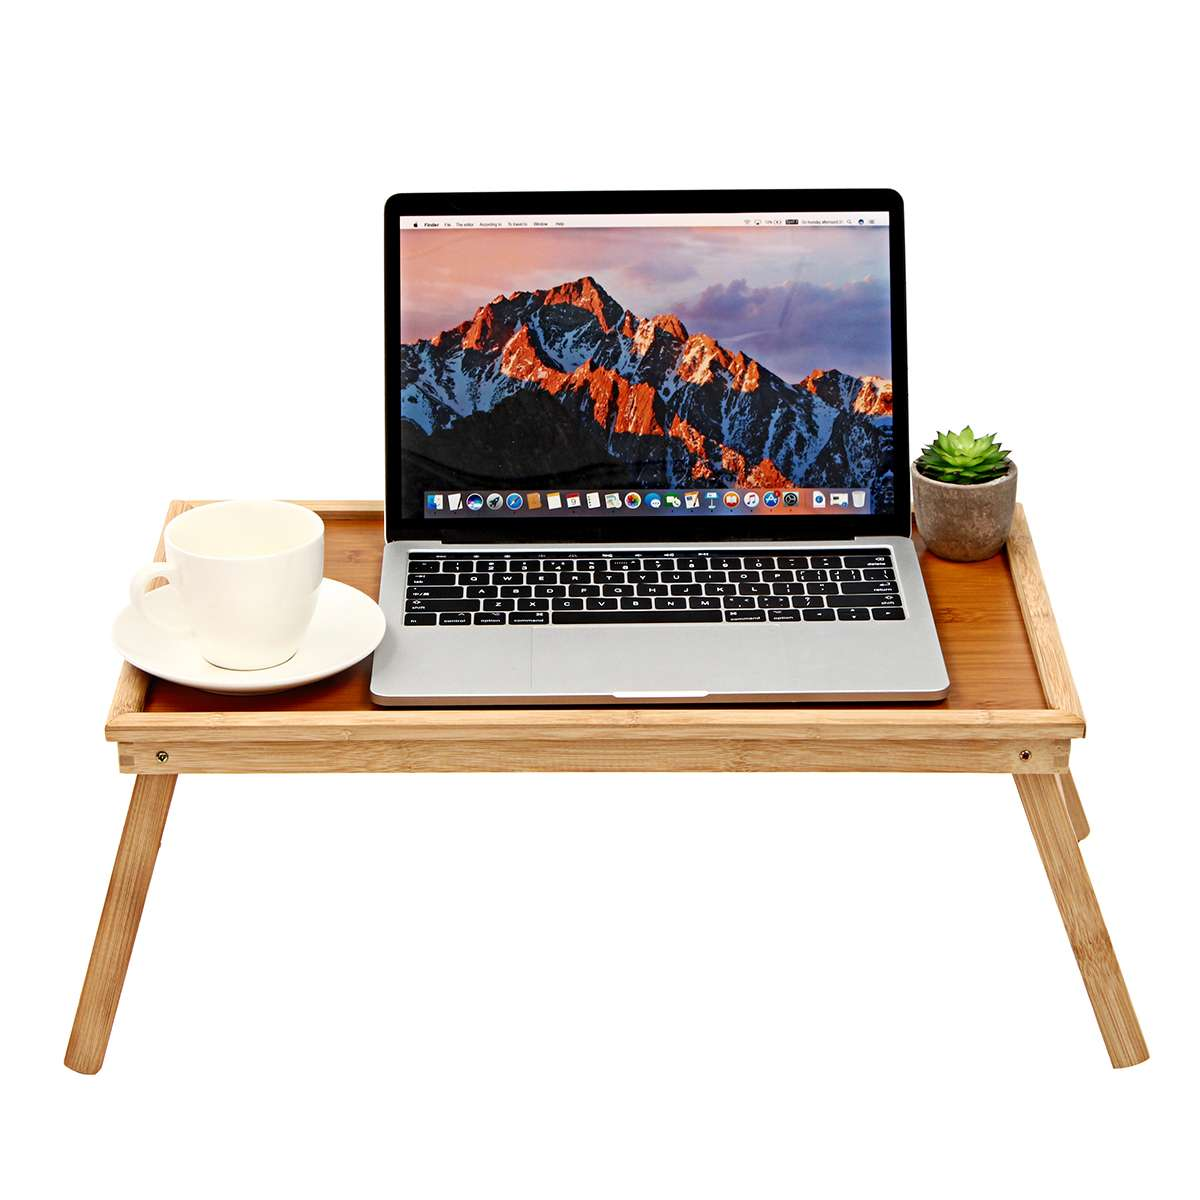 20'' Portable Bamboo Laptop Desk Bed Serving Tray Foldable Notebook Table Holder Computer Desks Office Furniture 50*30*20CM